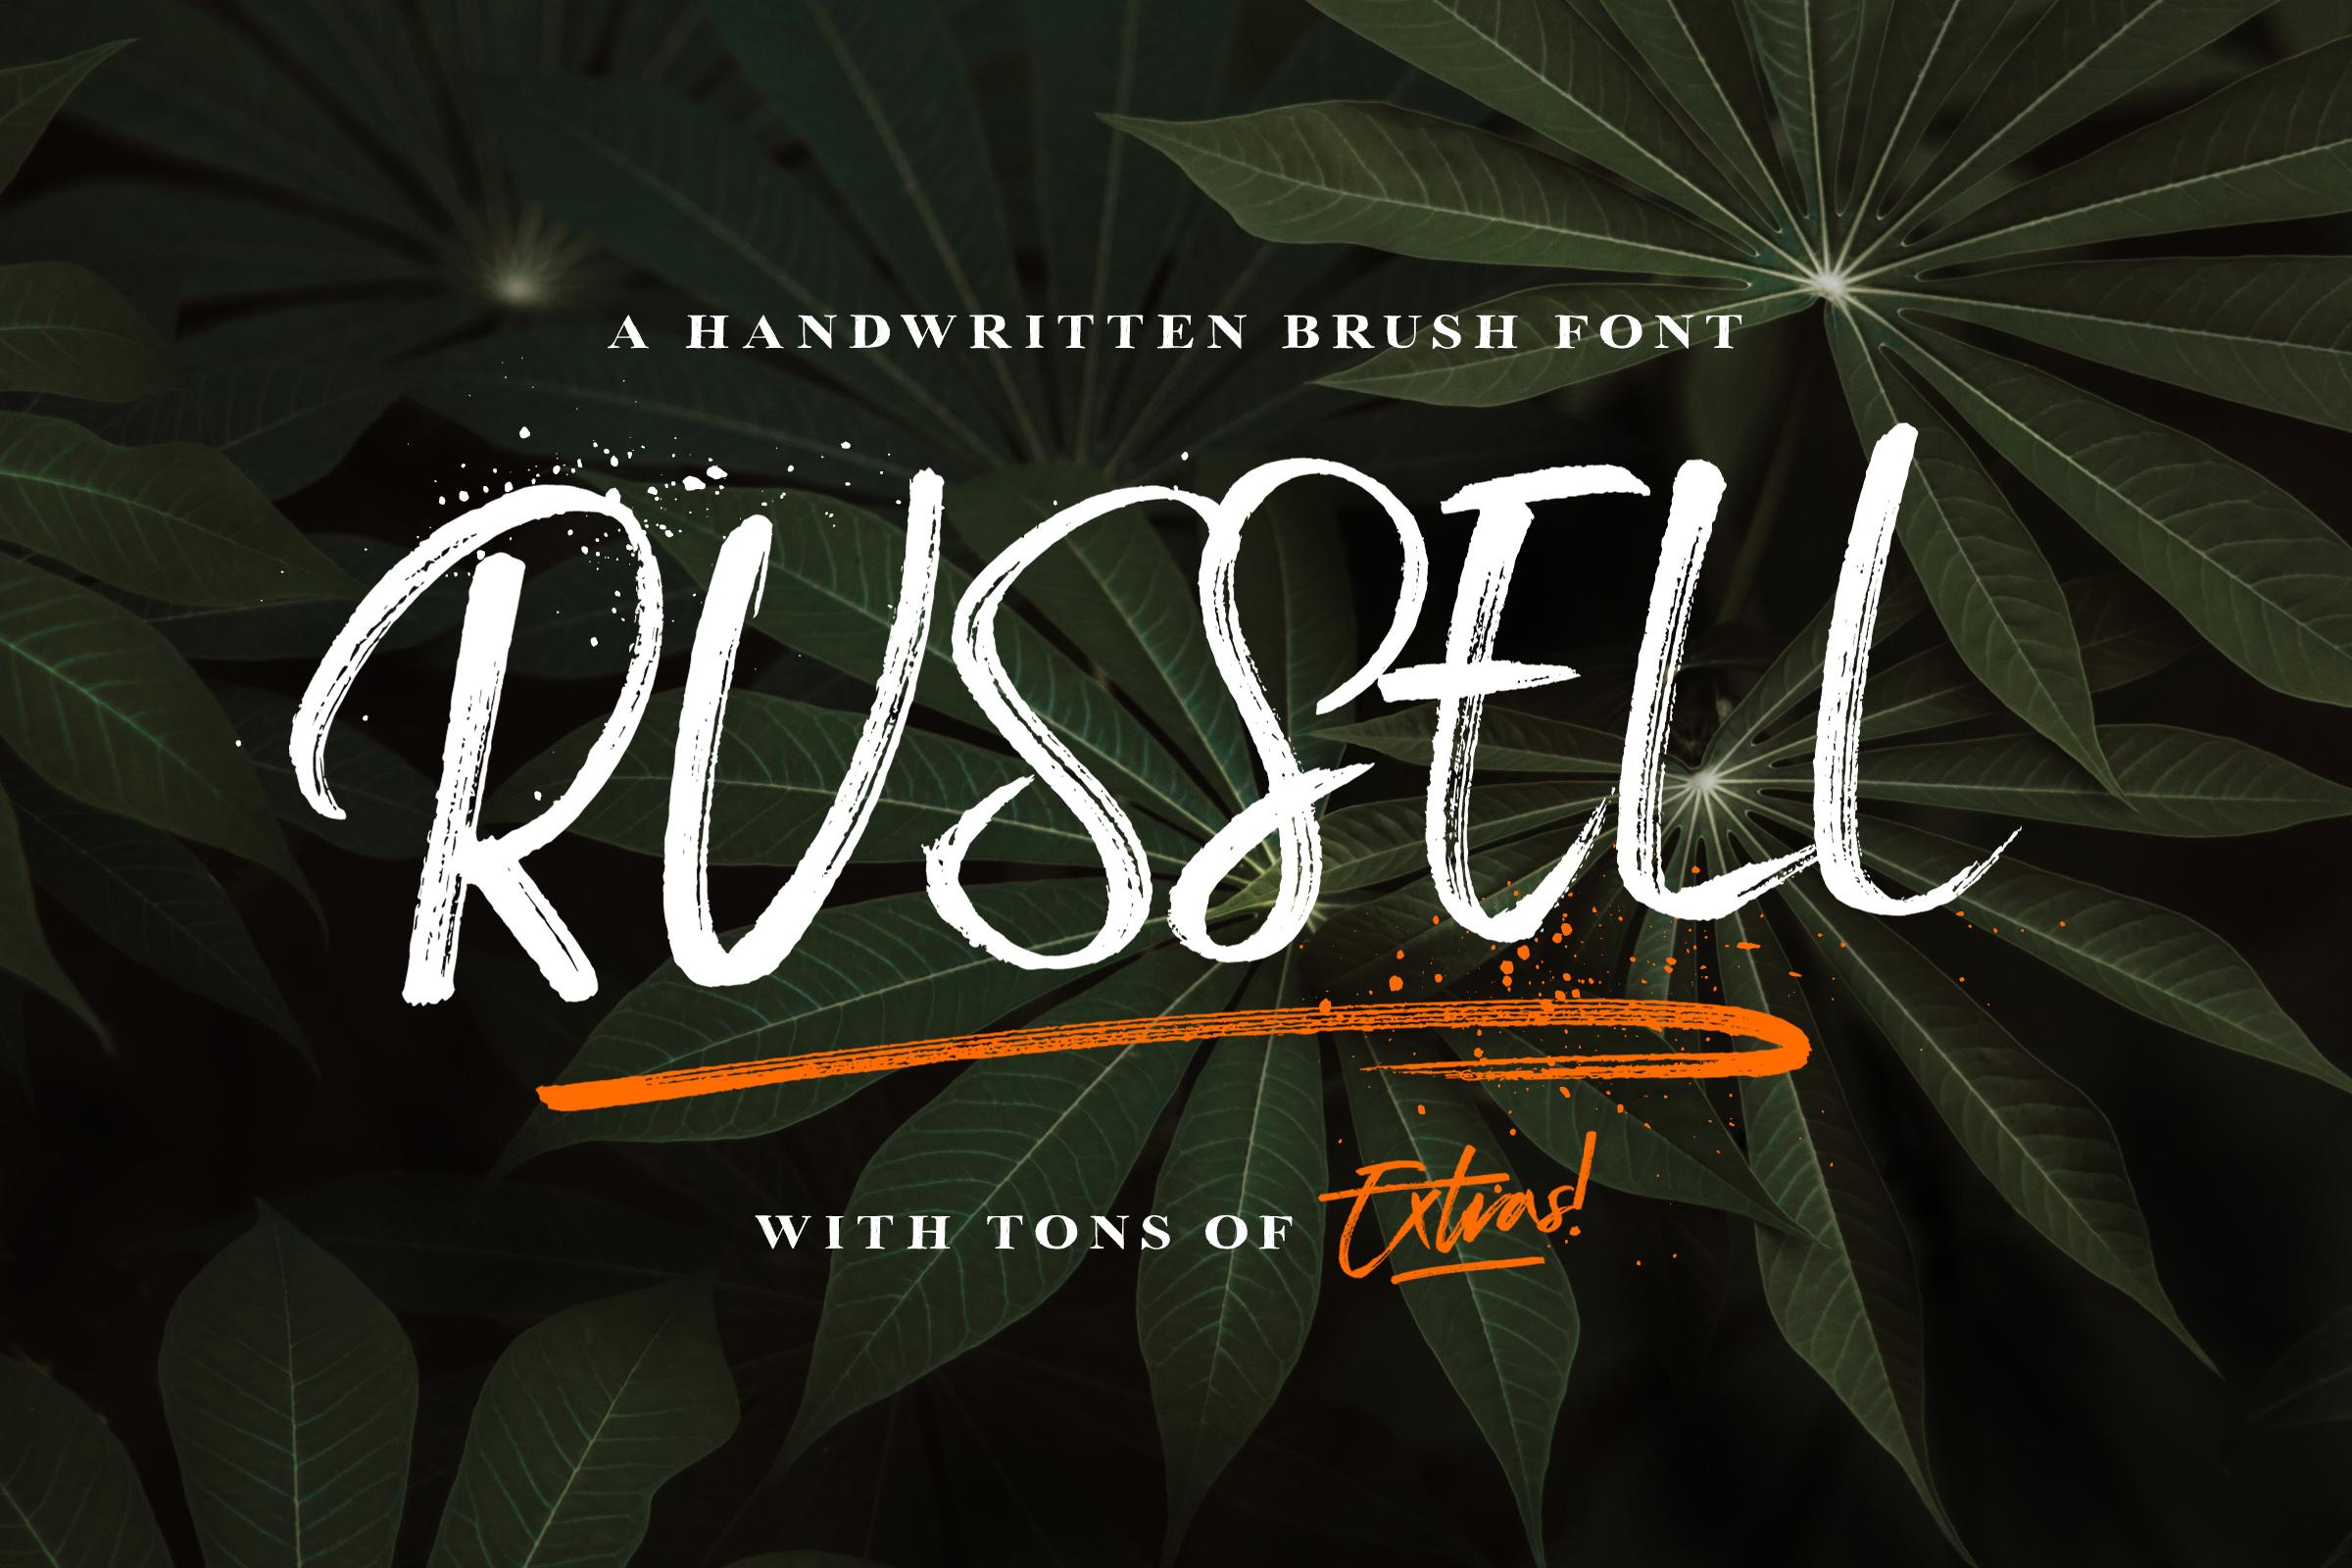 Russell-Brush-Script-Font-a